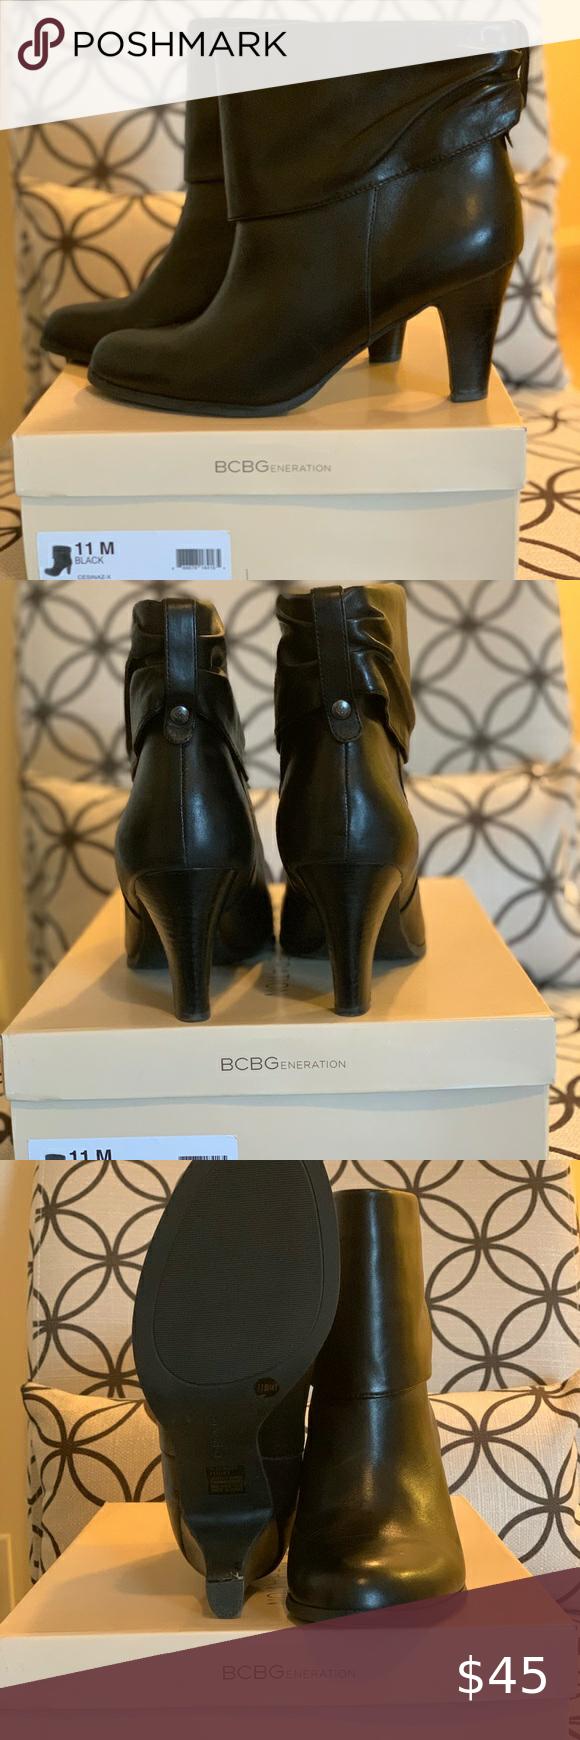 Black ankle boots, Shoes women heels